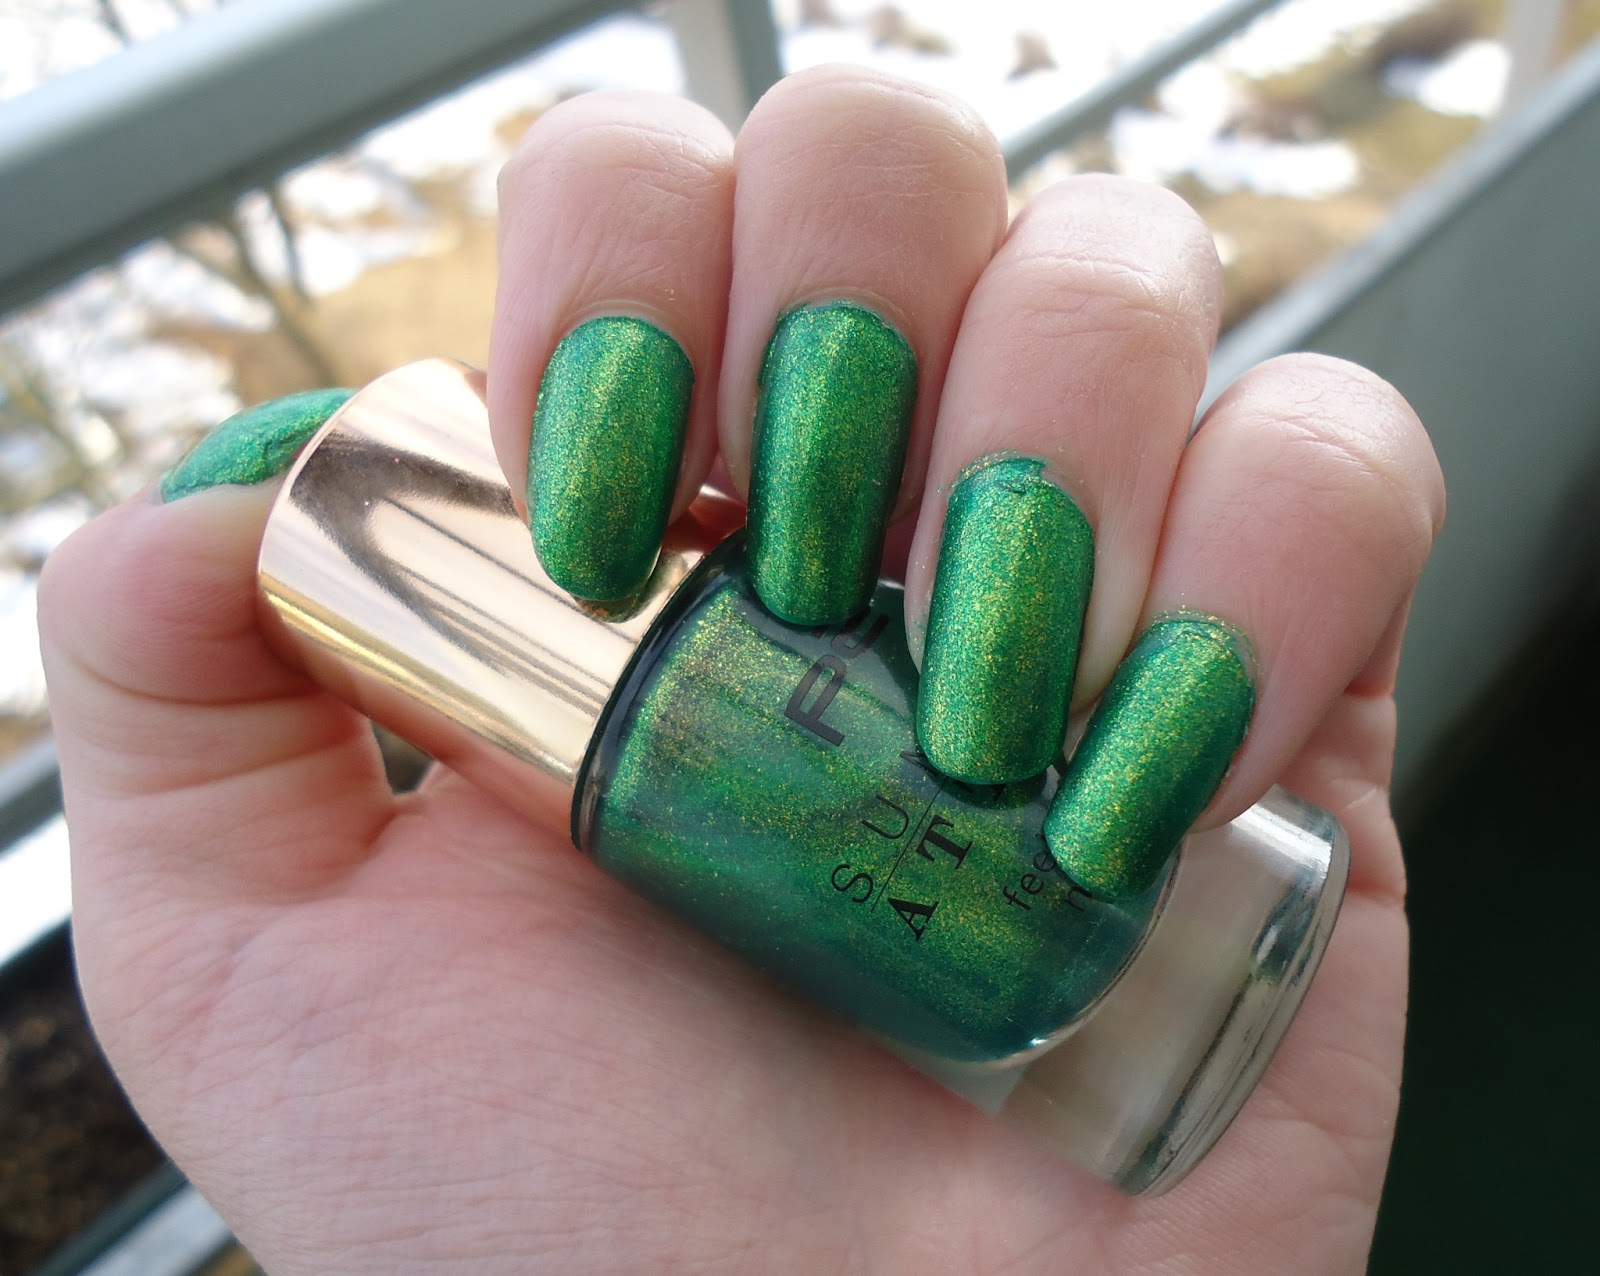 schminktussis welt beauty fashion lifestyle aus der n he berlins notd mit p2 green palm. Black Bedroom Furniture Sets. Home Design Ideas